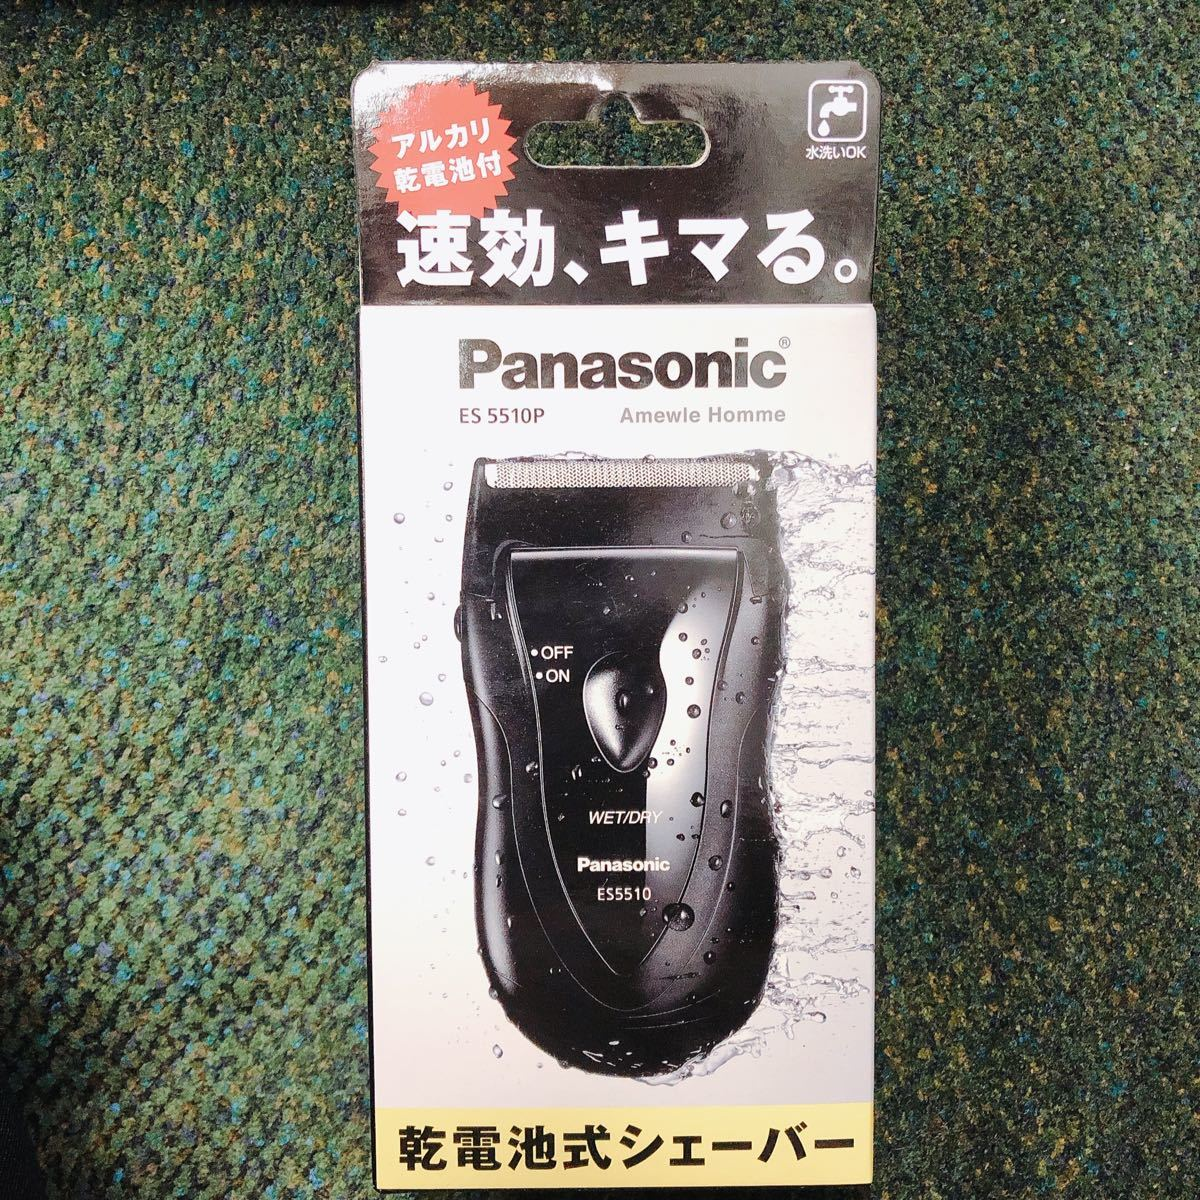 Panasonic メンズシェーバー 乾電池式シェーバー ES5510P